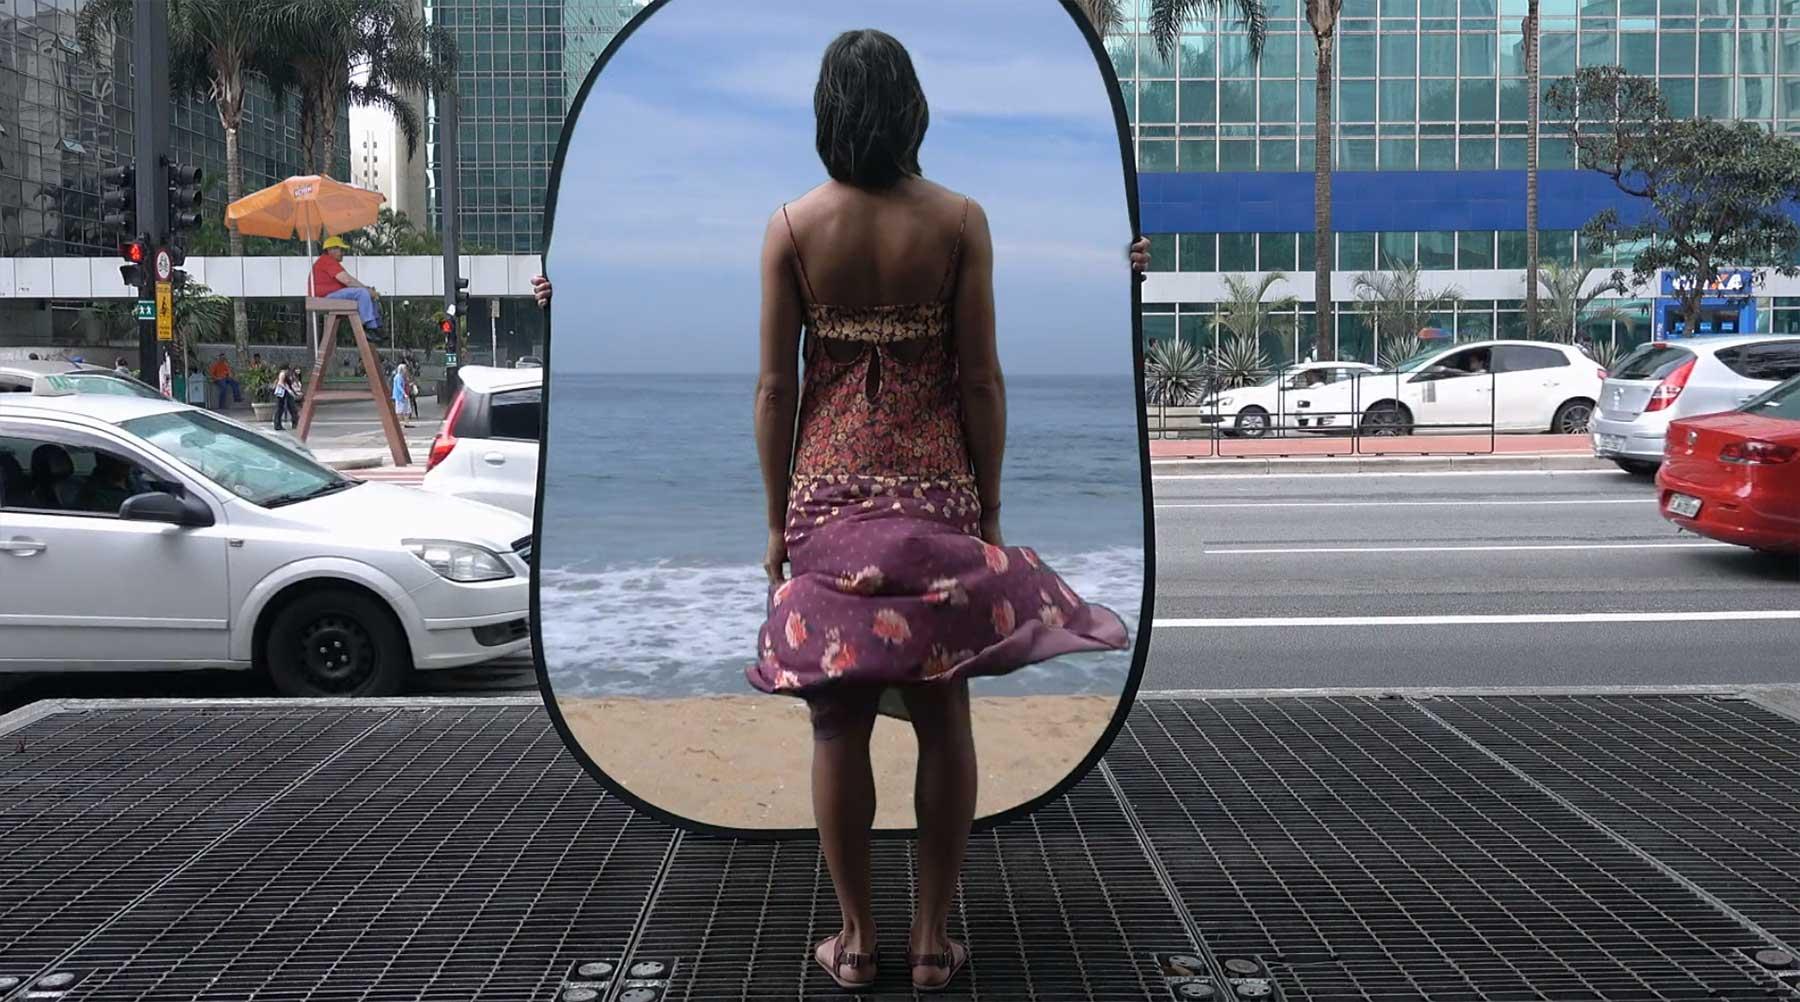 Mit dem Green Screen durch Brasilien zieh'n green-screen-gringo